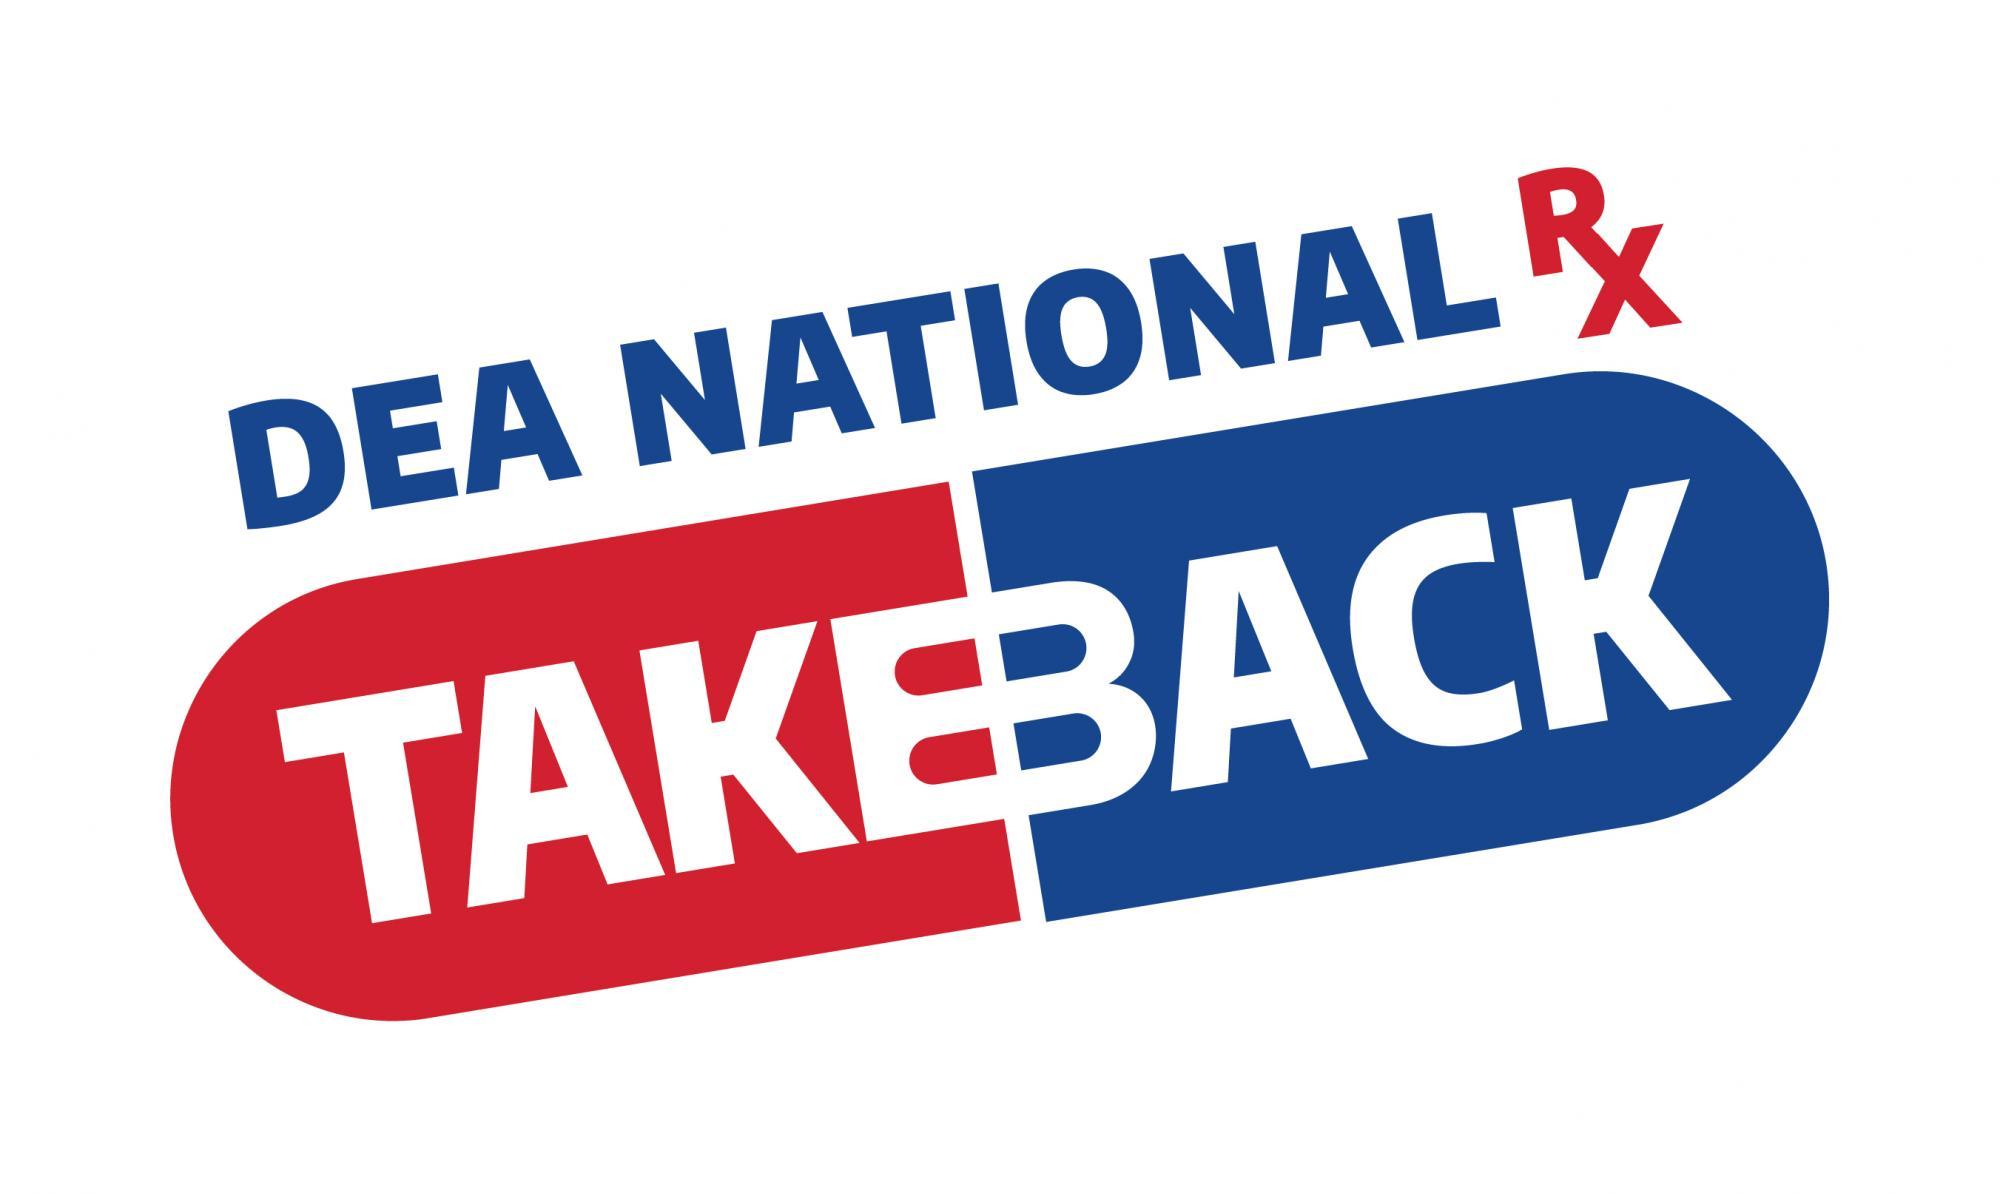 Partner Toolkit for the 2018 National Prescription Drug TakeBack Day